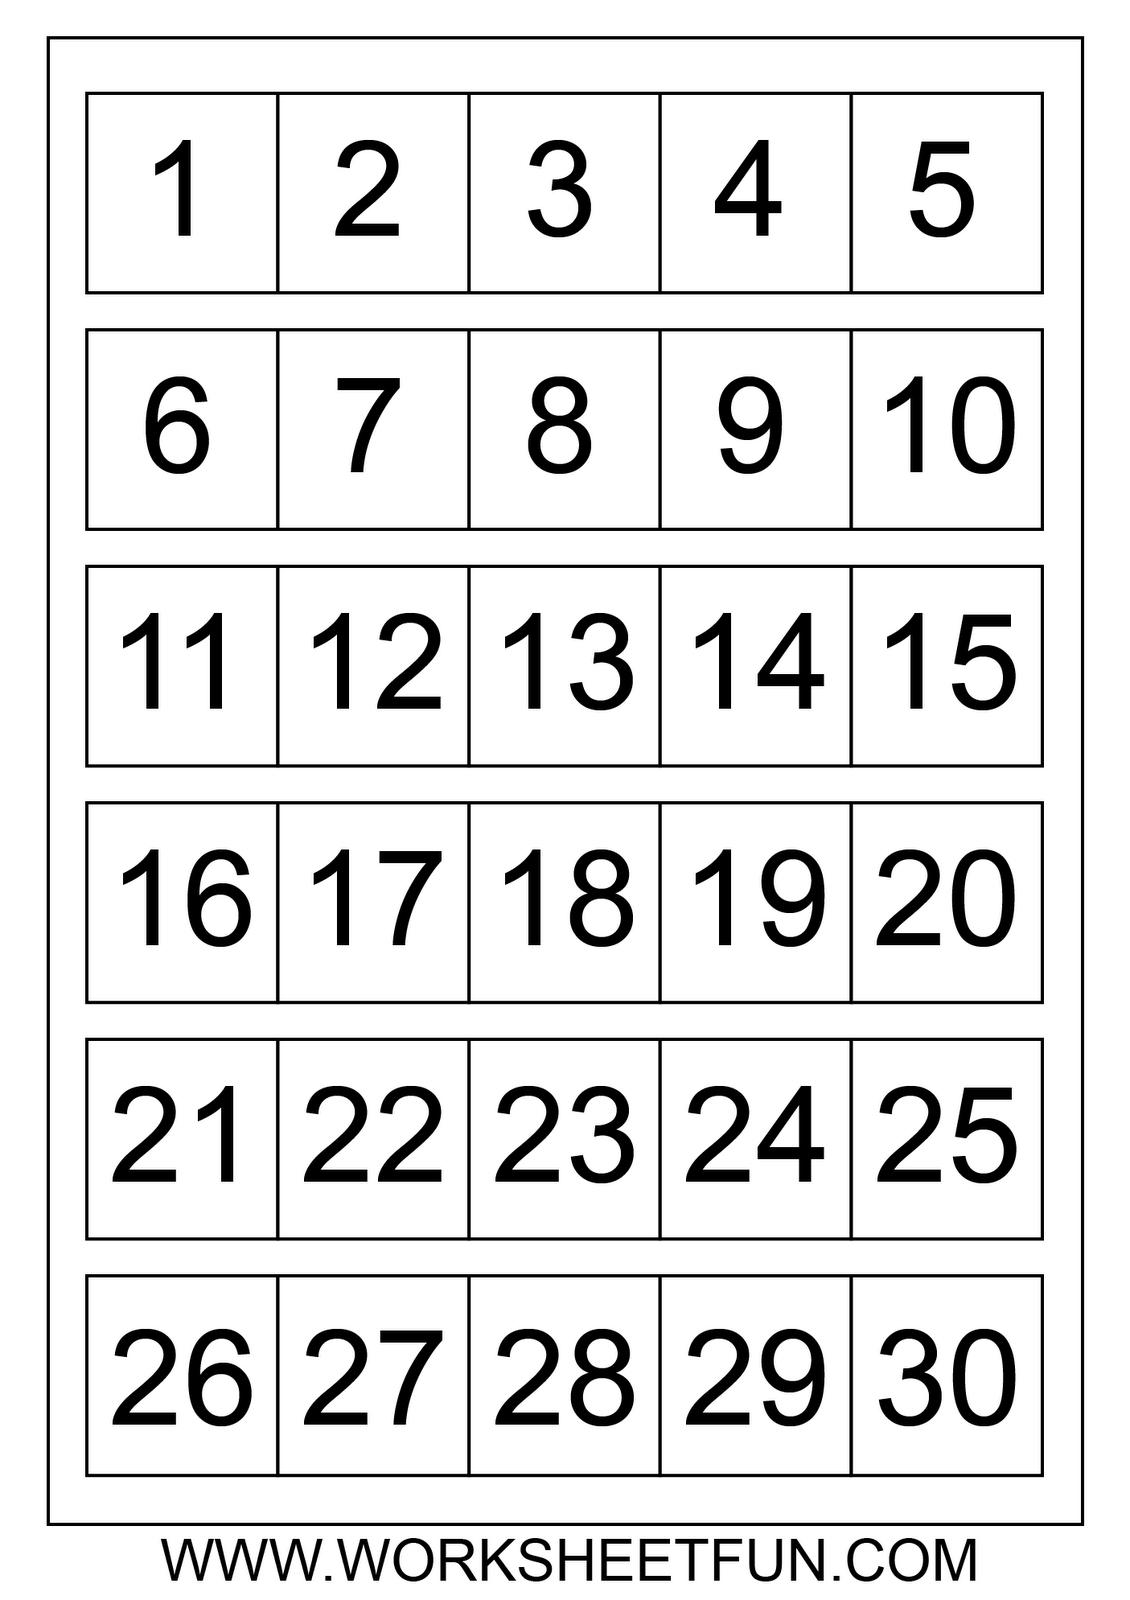 Numbers 1 31 To Print | Template Calendar Printable with regard to Printable Numbers 1-31 For Calendar